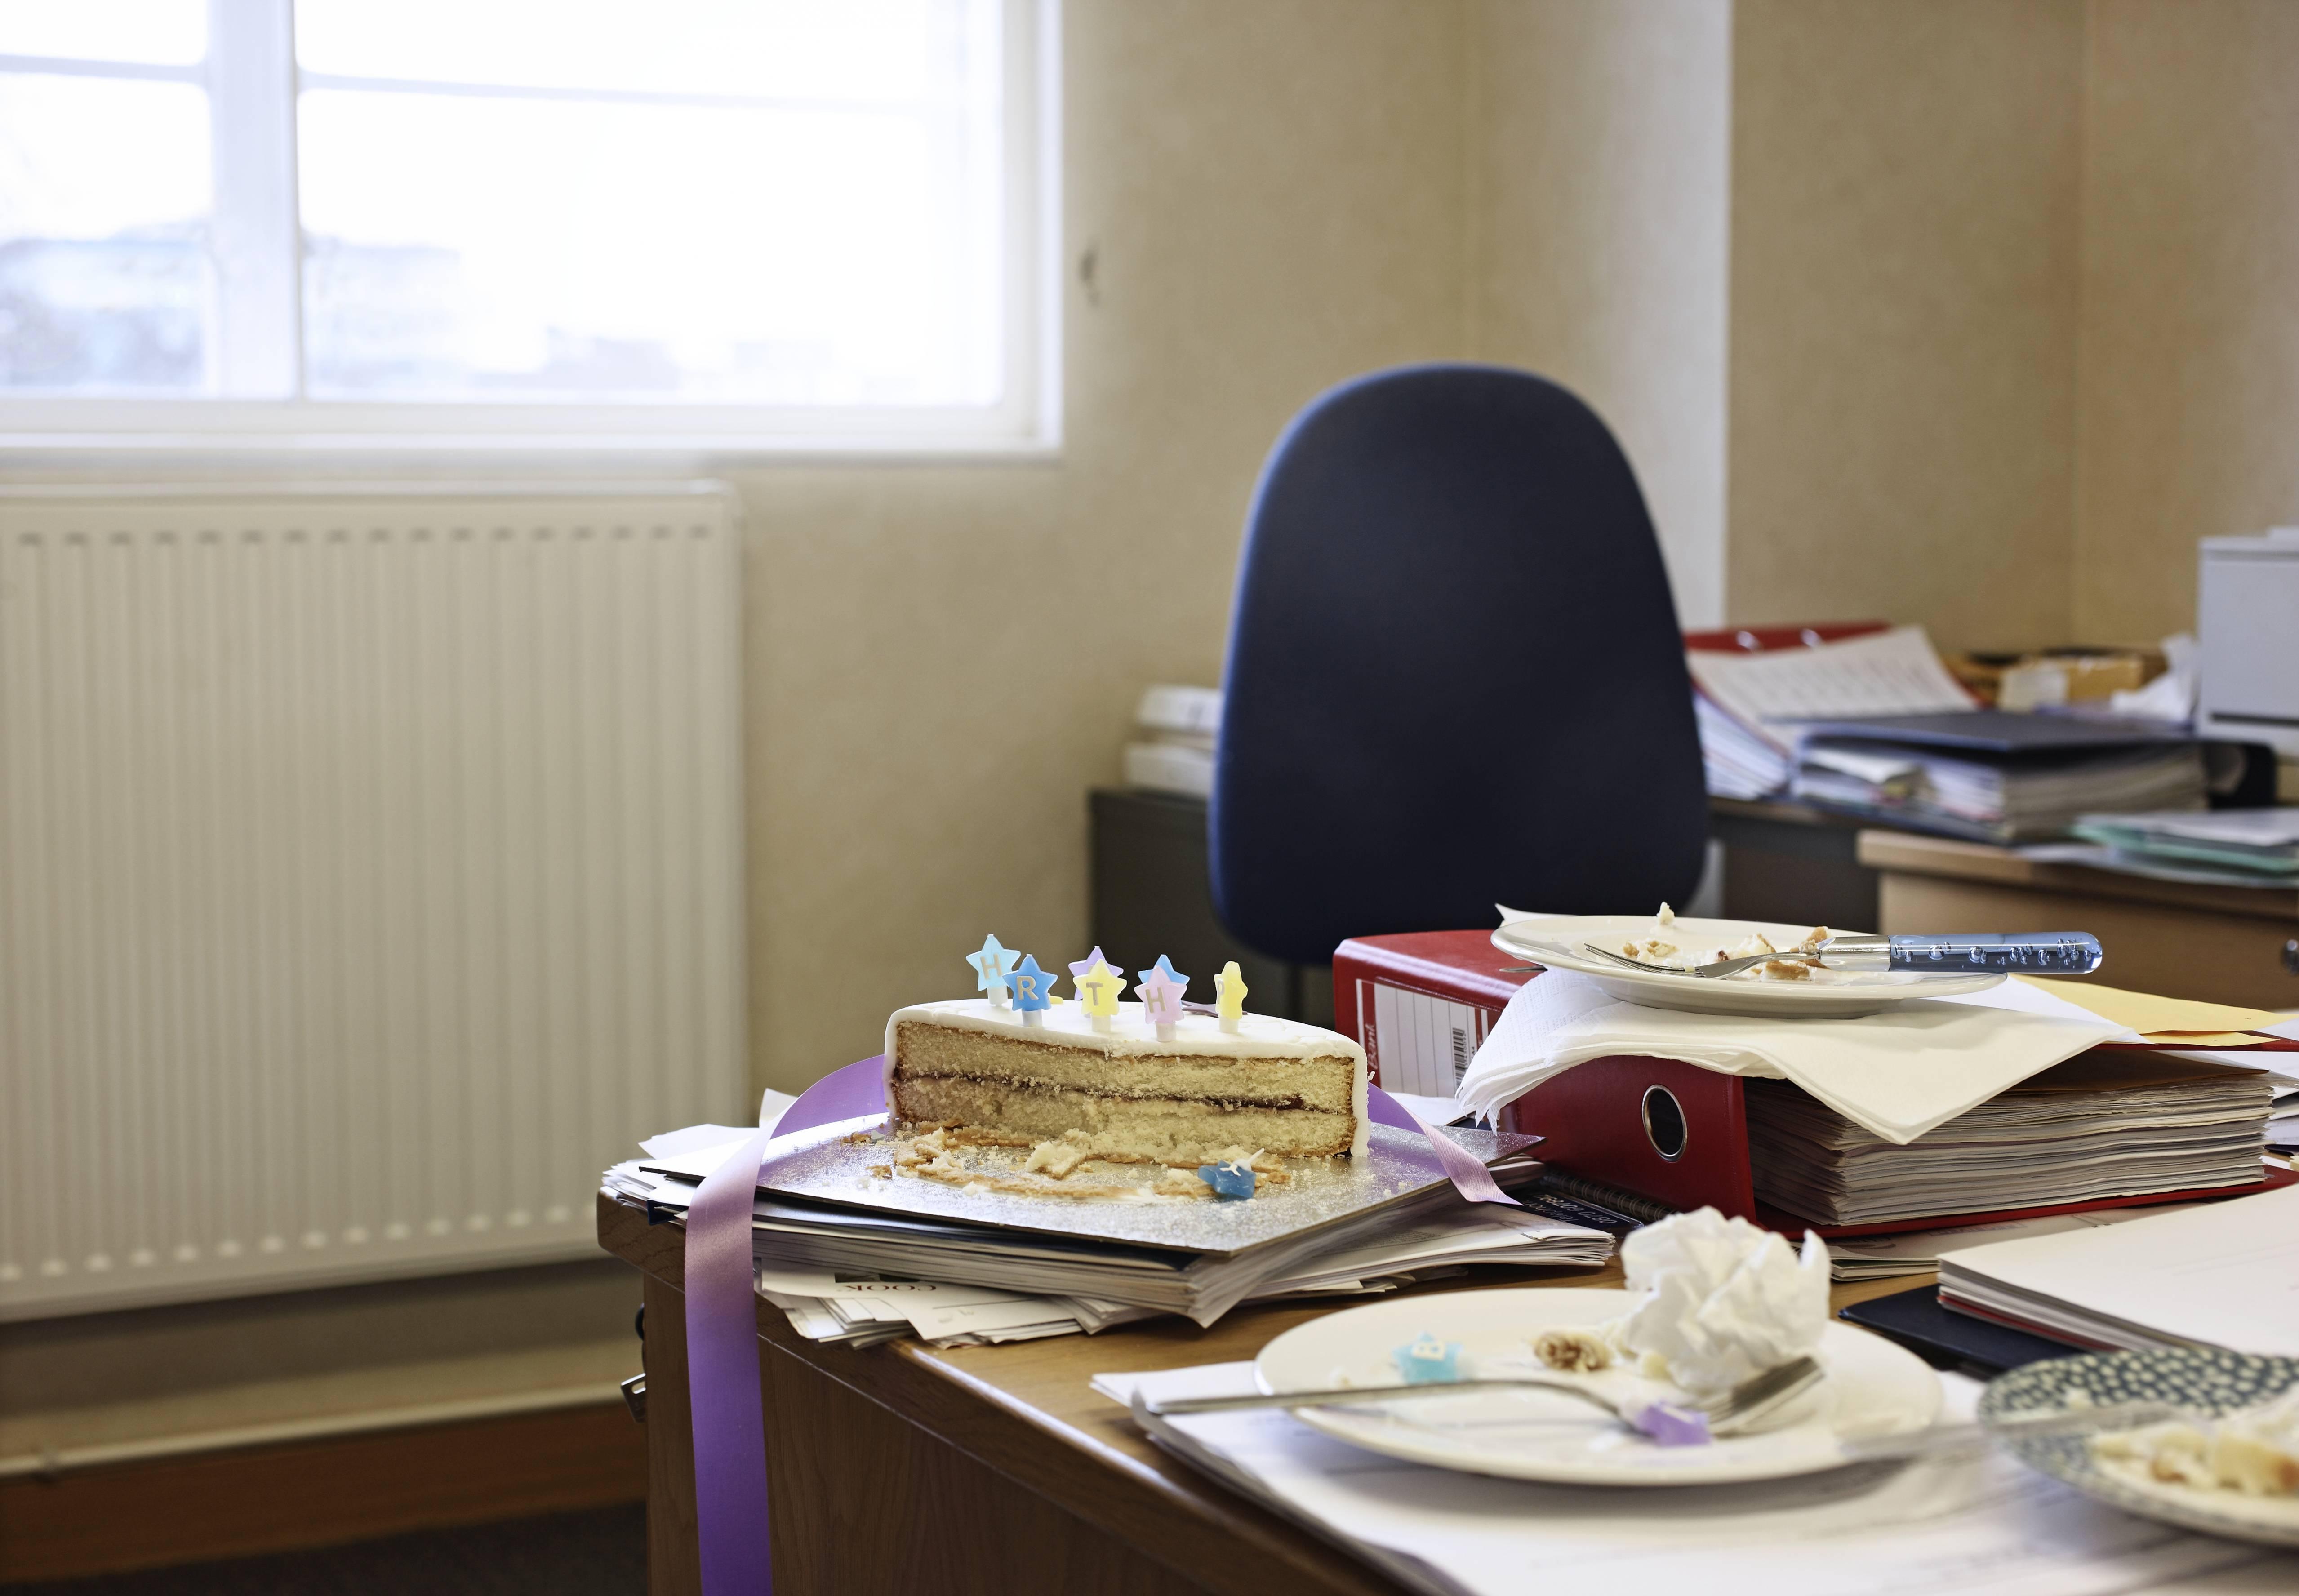 birthday cake on desk in office